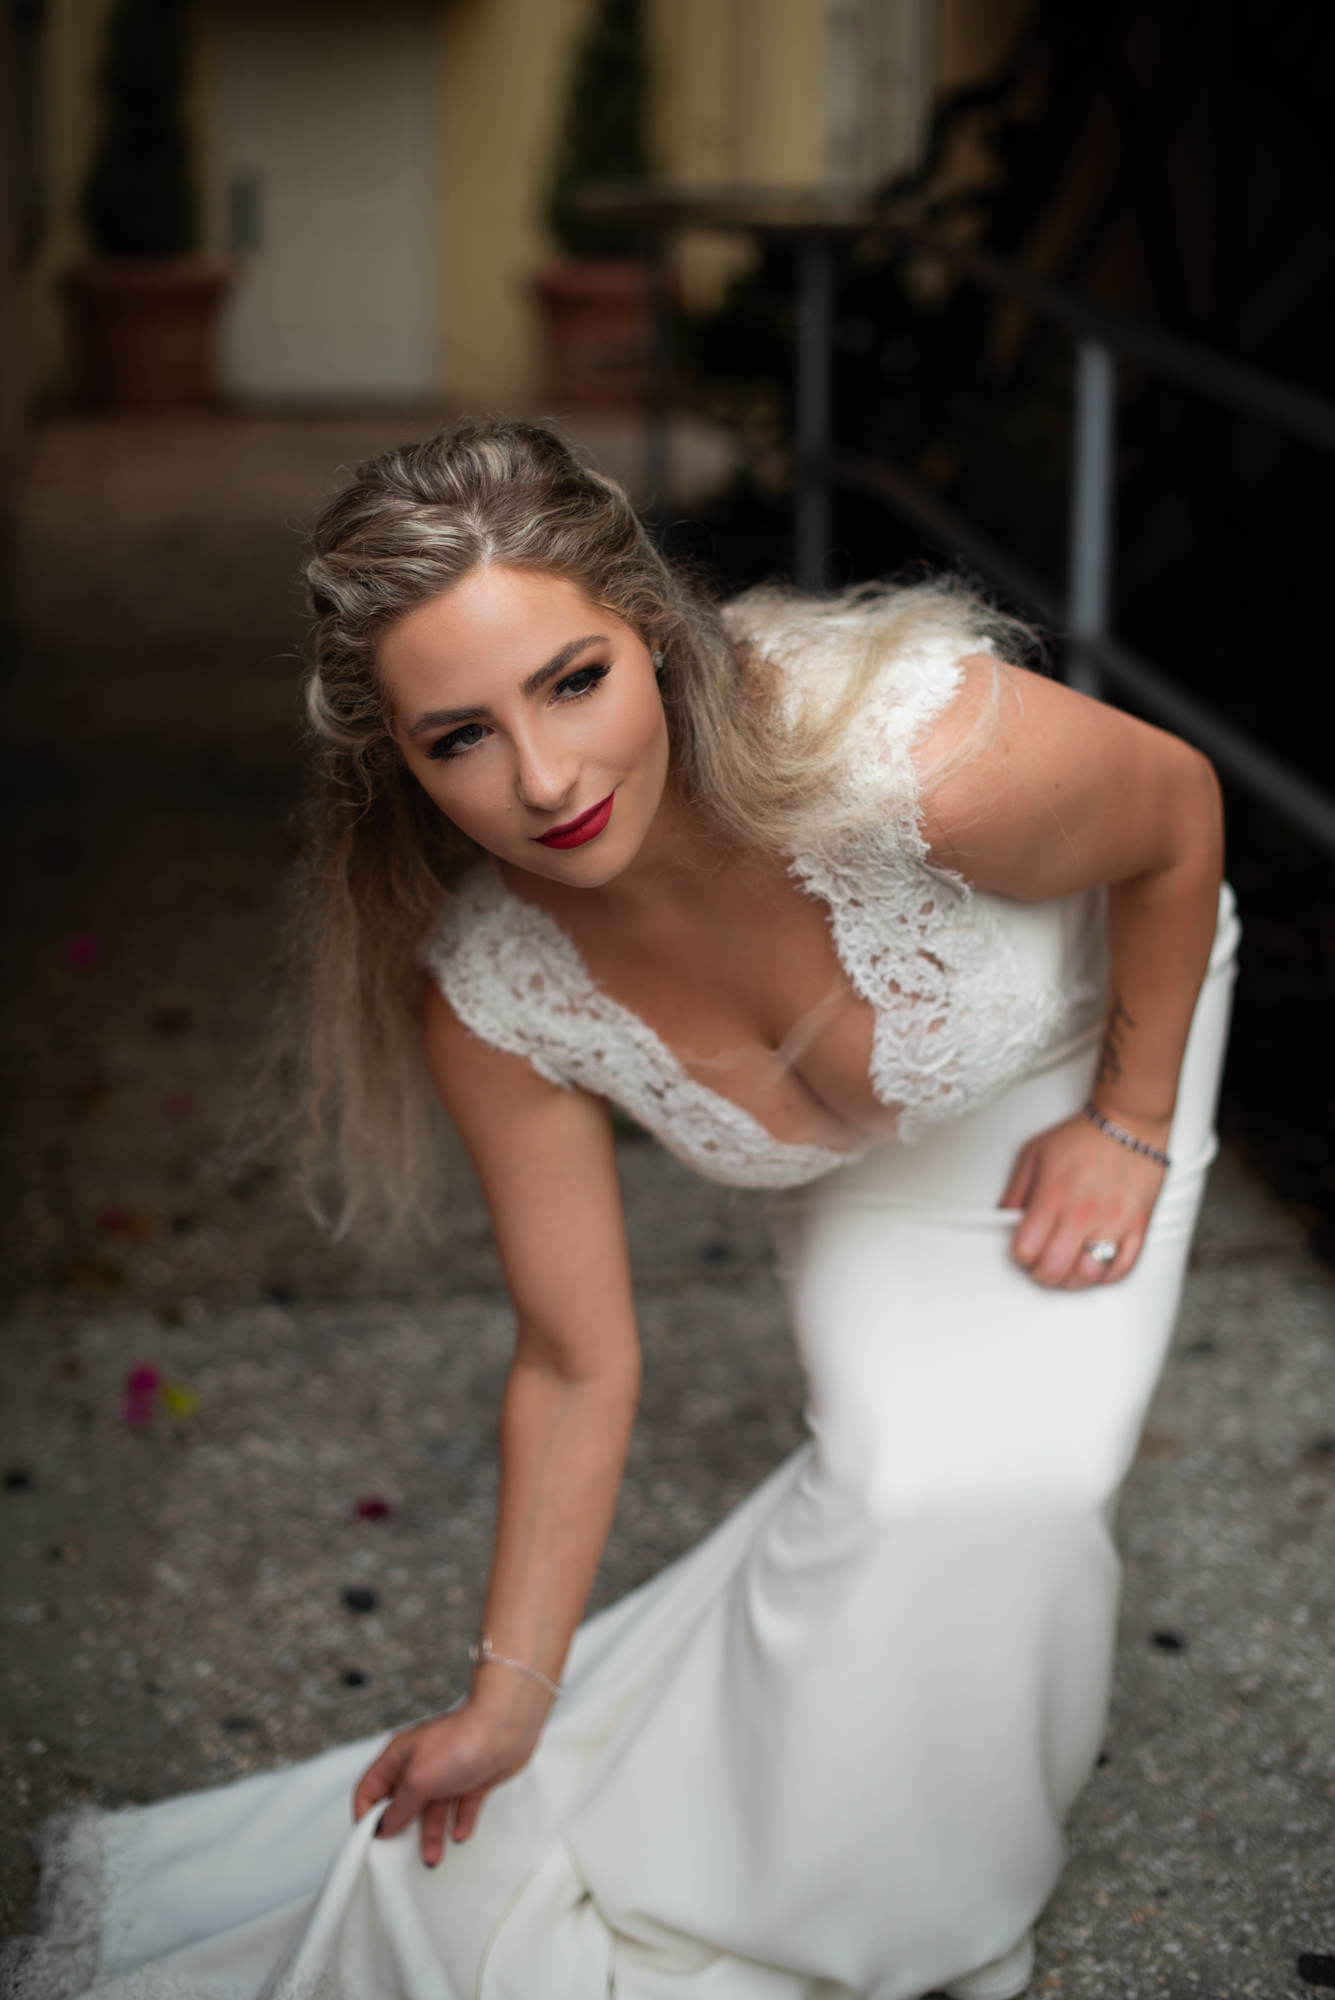 st-augustine-photographer-st-augustine-gay-wedding-sam-sex-wedding-photographer-sarah-annay-photography-white-room-weddings-47.jpg